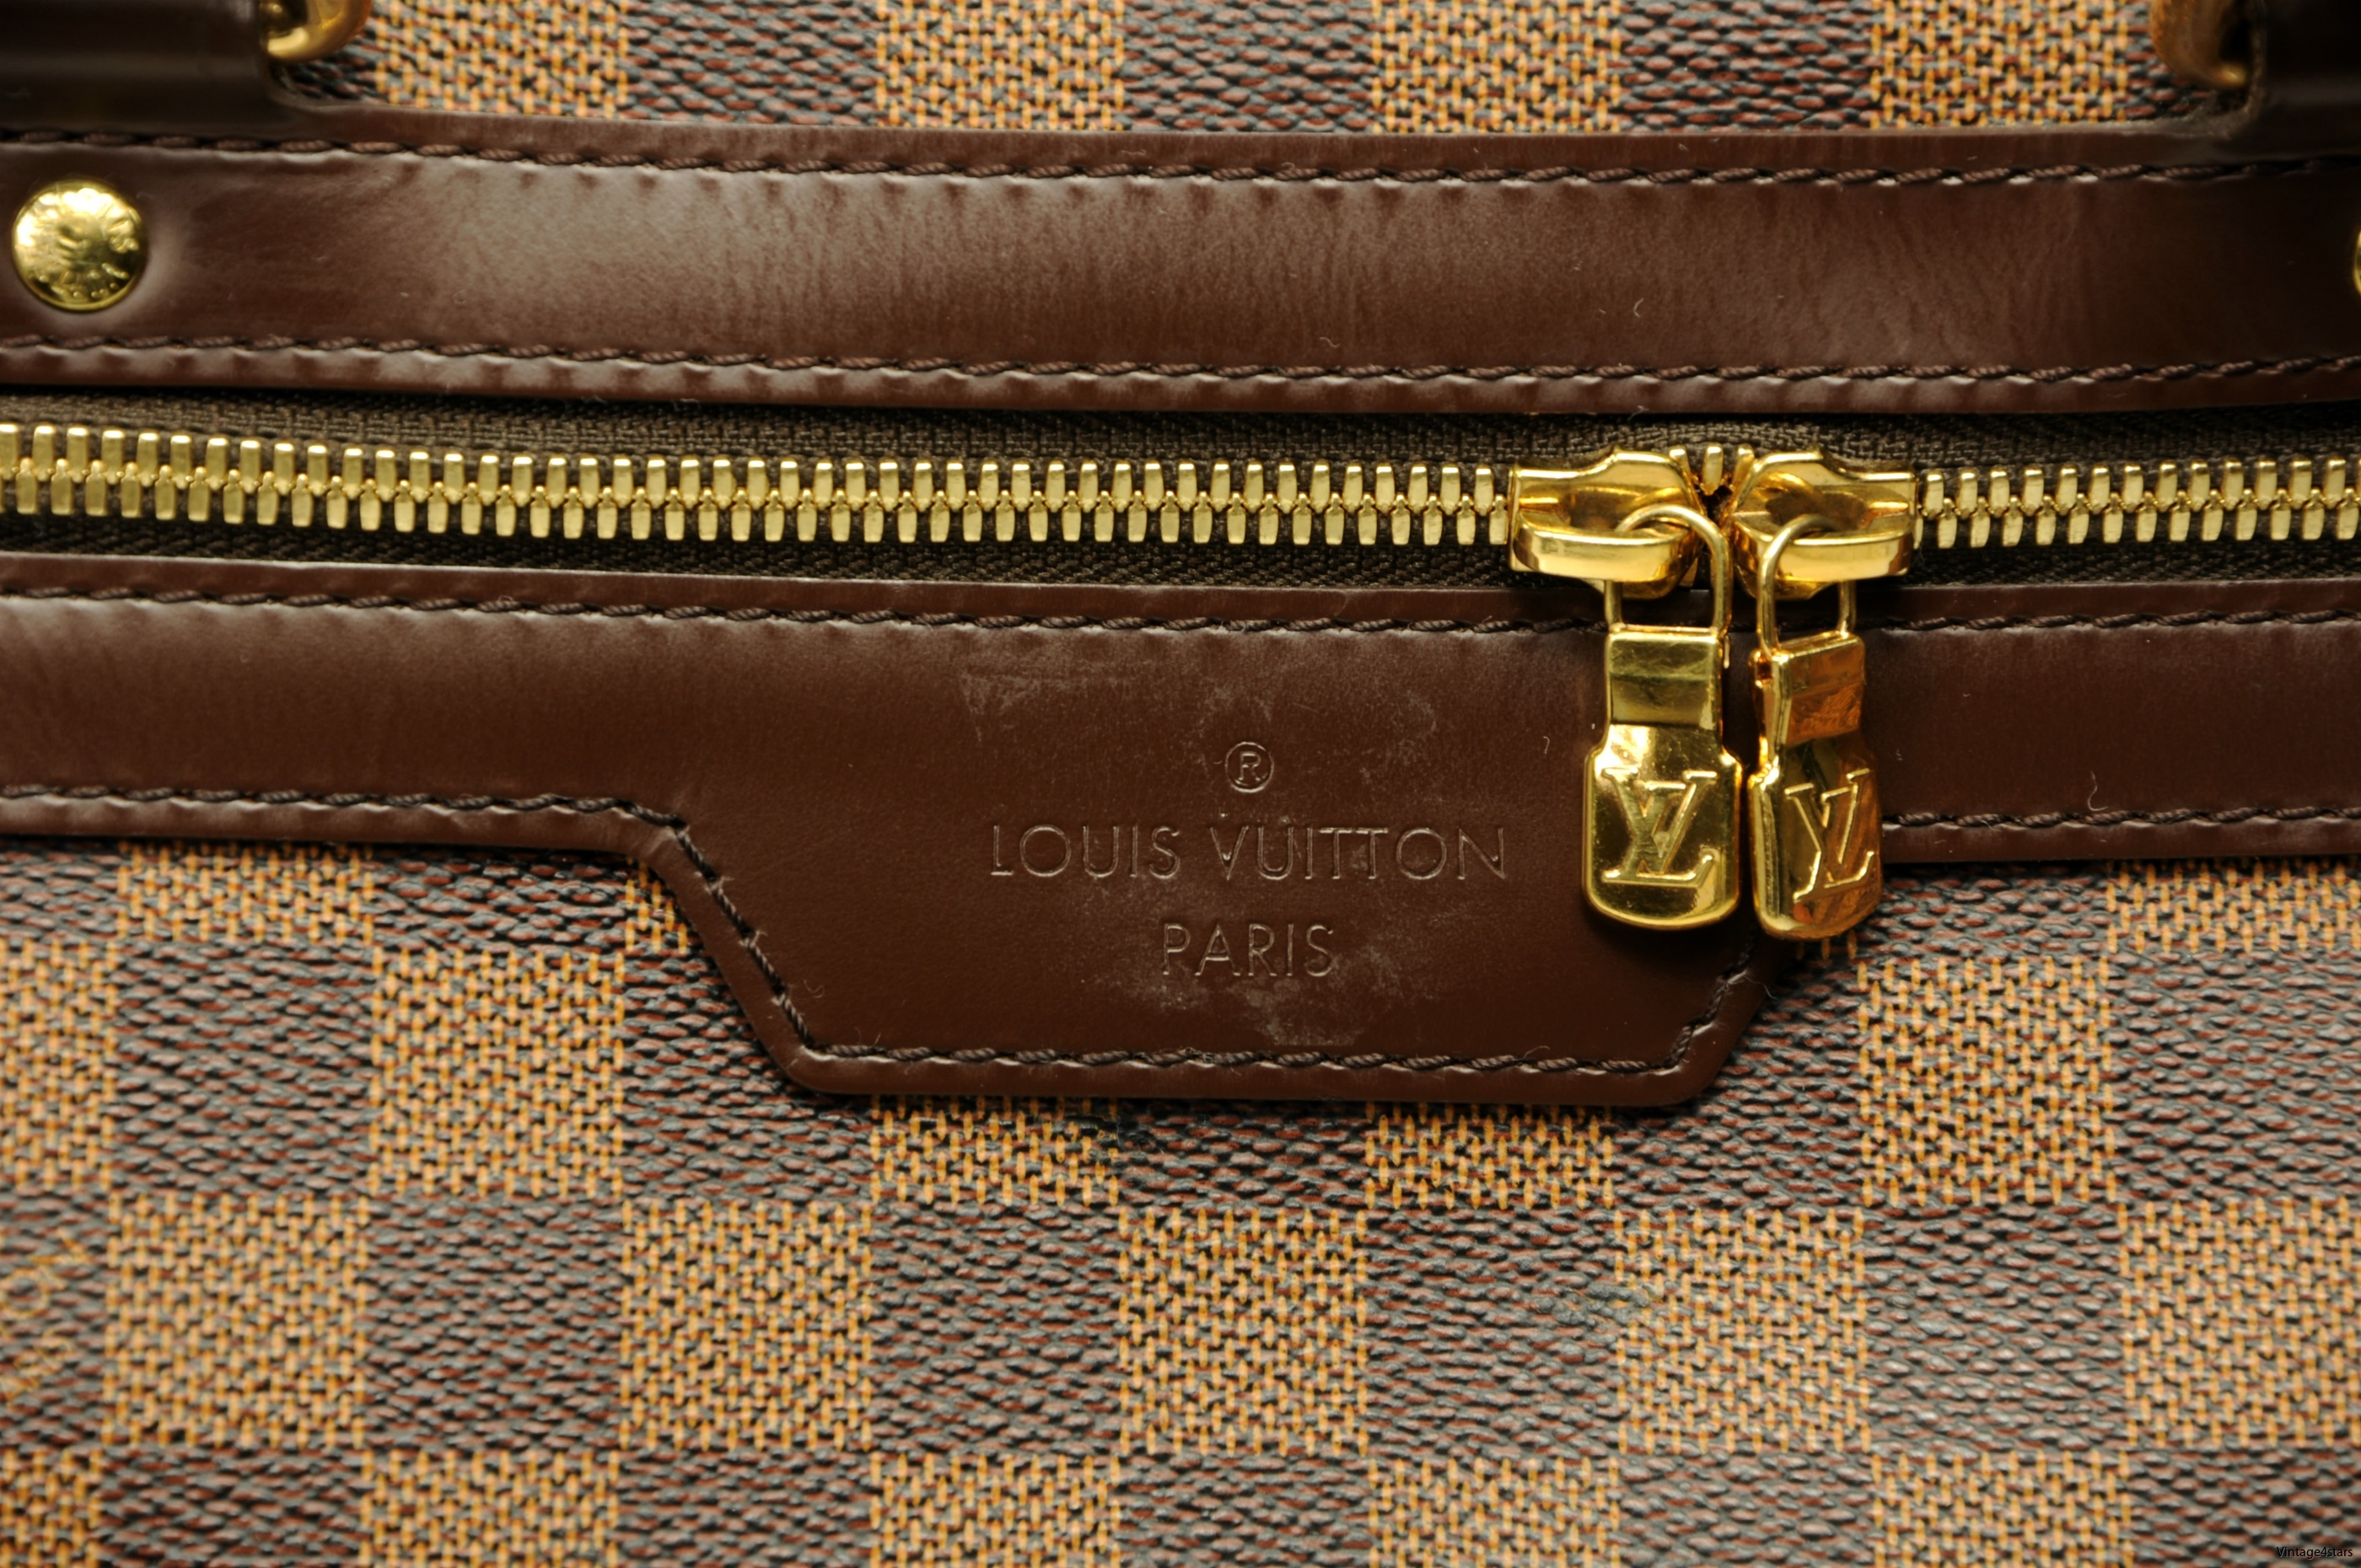 Louis Vuitton Eole 60 Damier Ebene 14